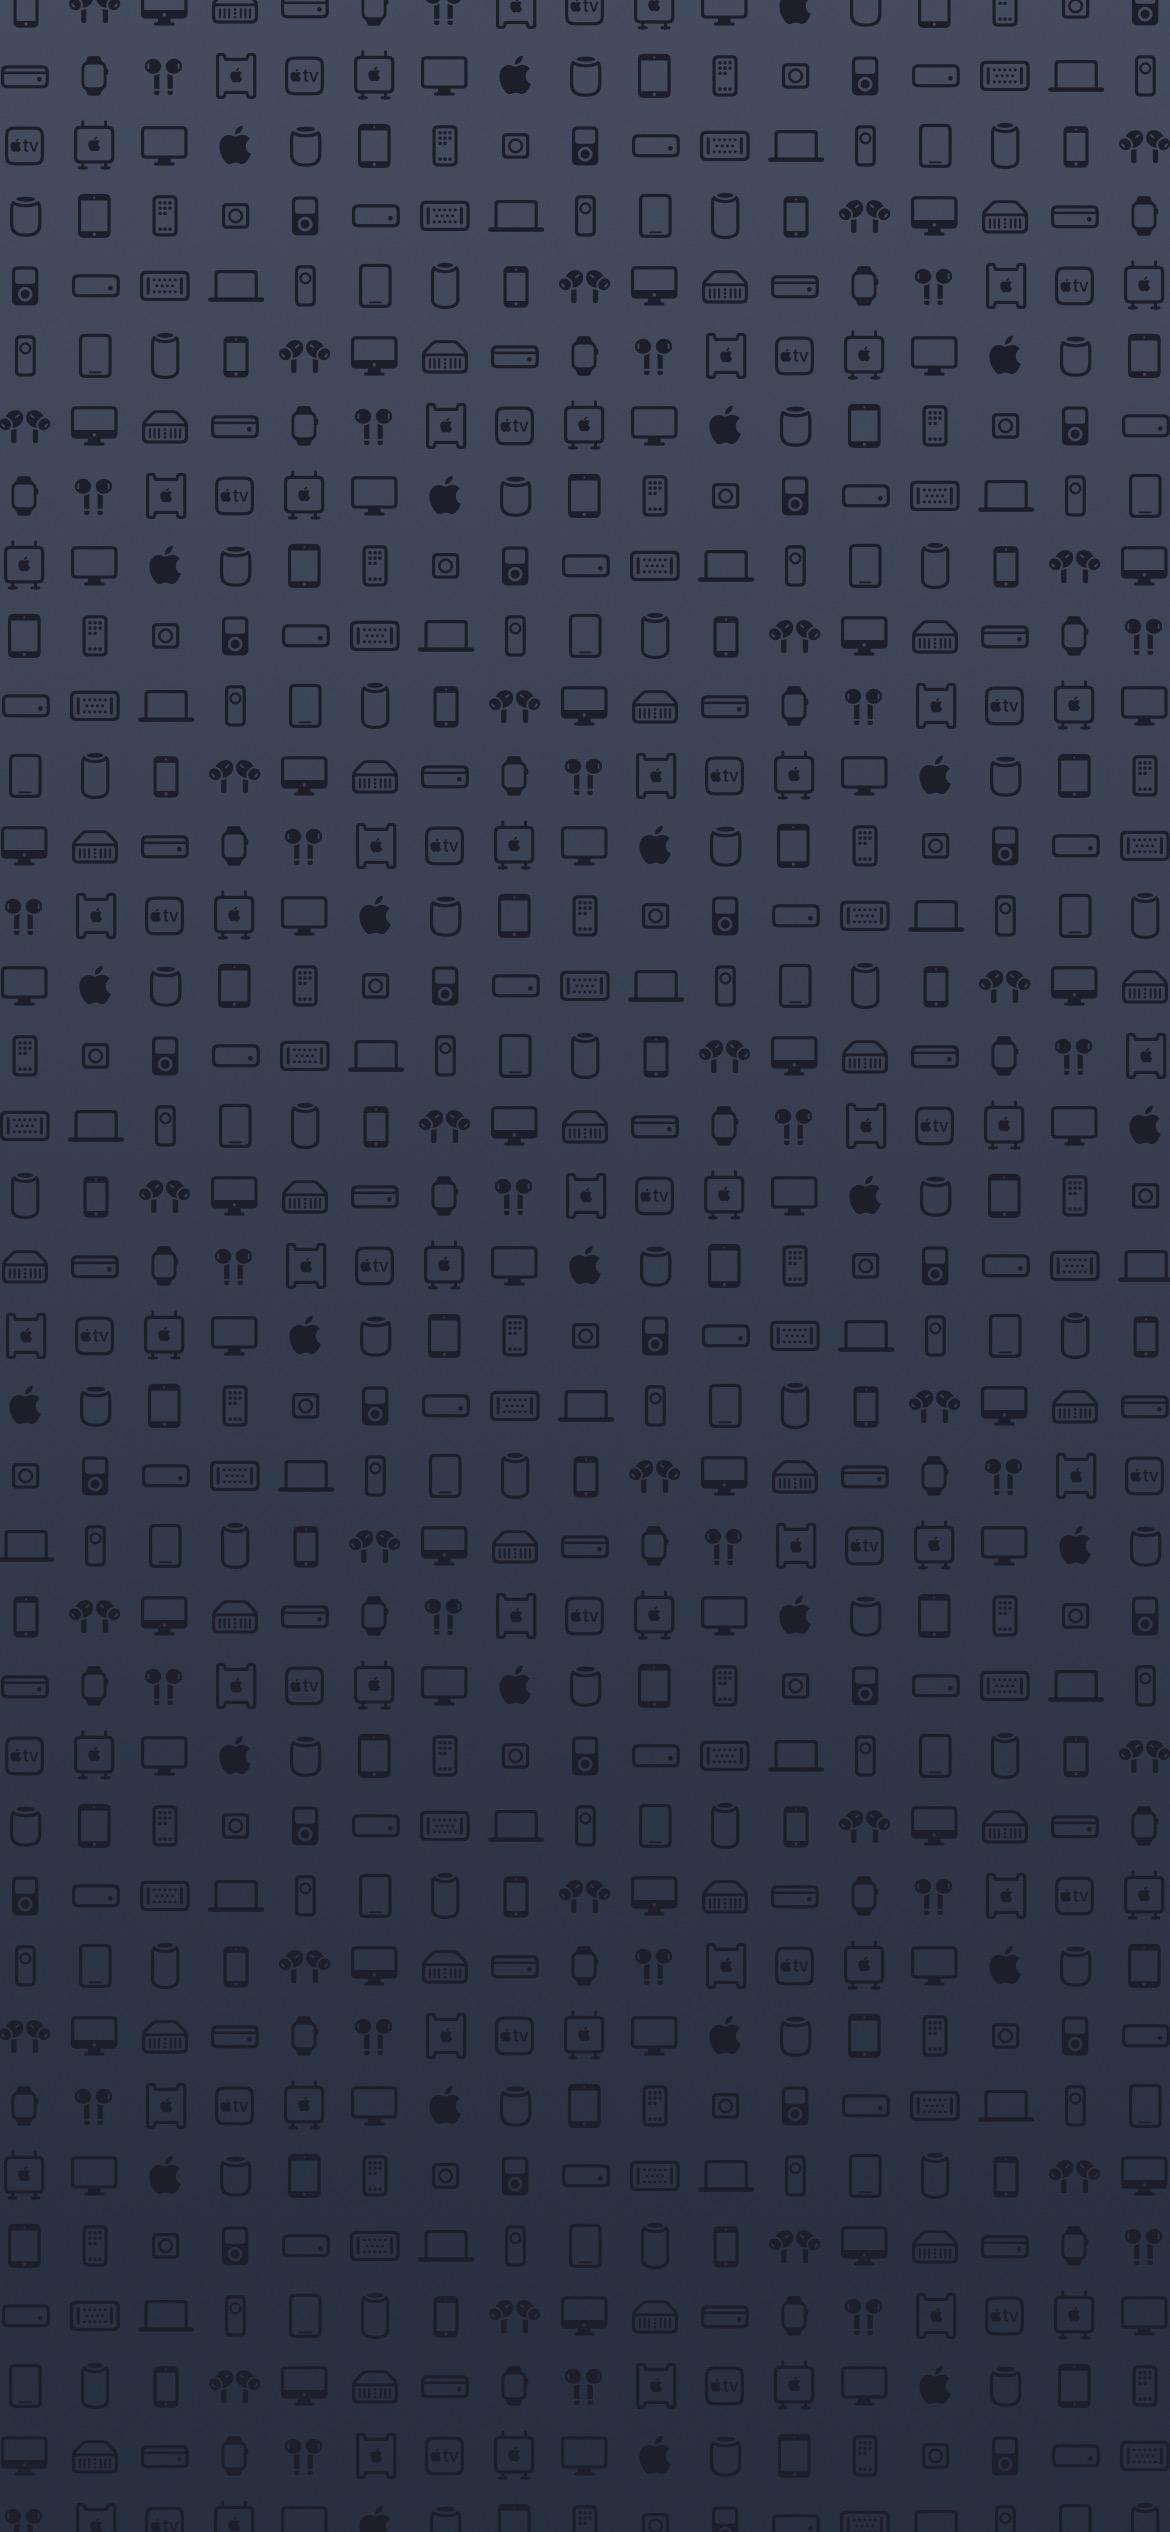 SF Symbols BasicAppleGuy iDownoadBlog iPhone12Pro Navy